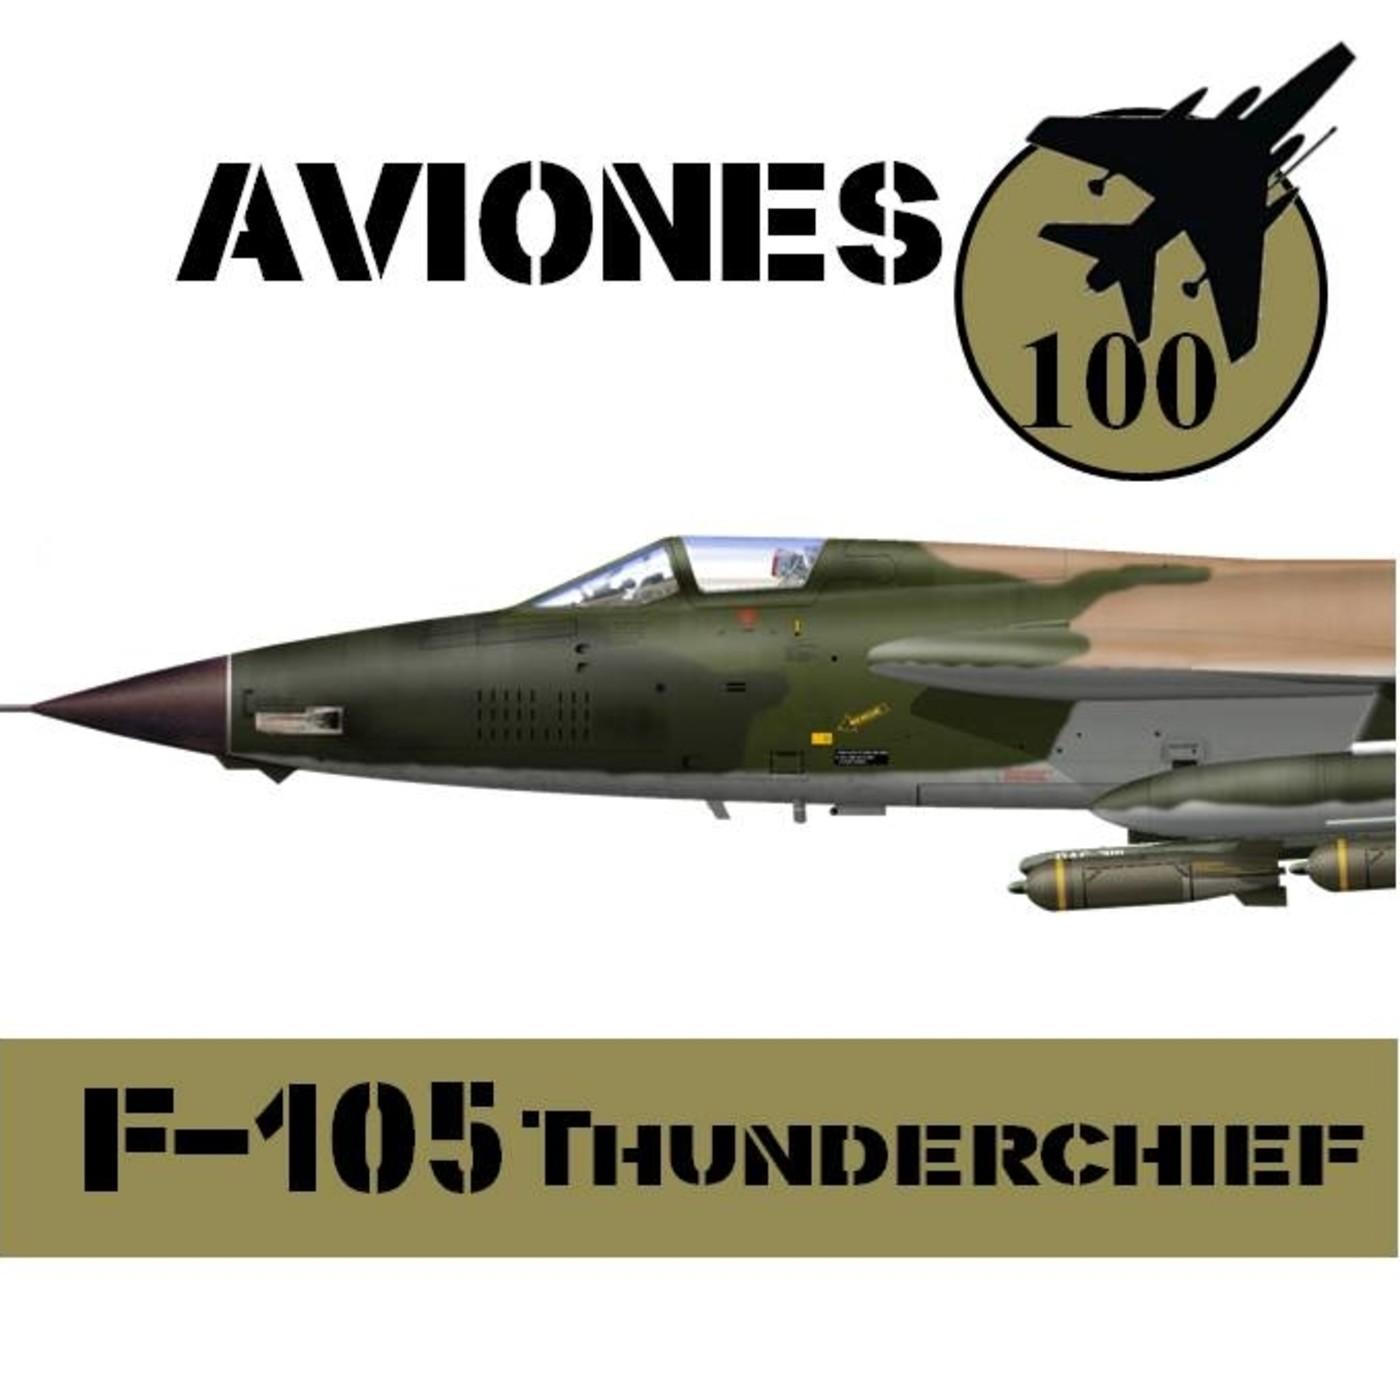 Aviones 10 #80 F-105 Thunderchief. Century Series 6d6 - Historia Vietnam